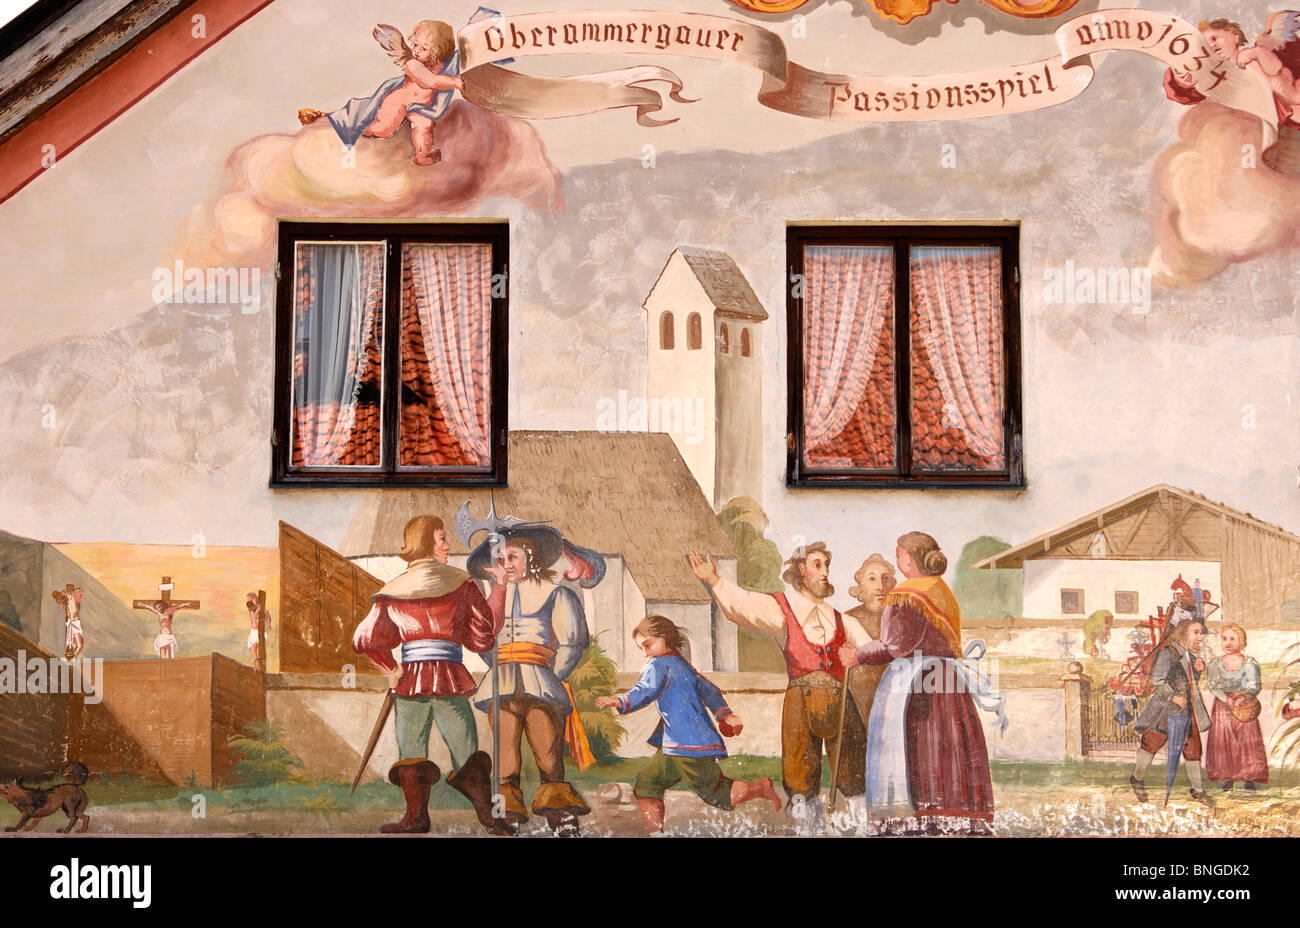 Tromp l'oeil frescoes with scenes of the Oberammergau Passion Plays, Oberammergau, Bavaria, Germany - Stock Image